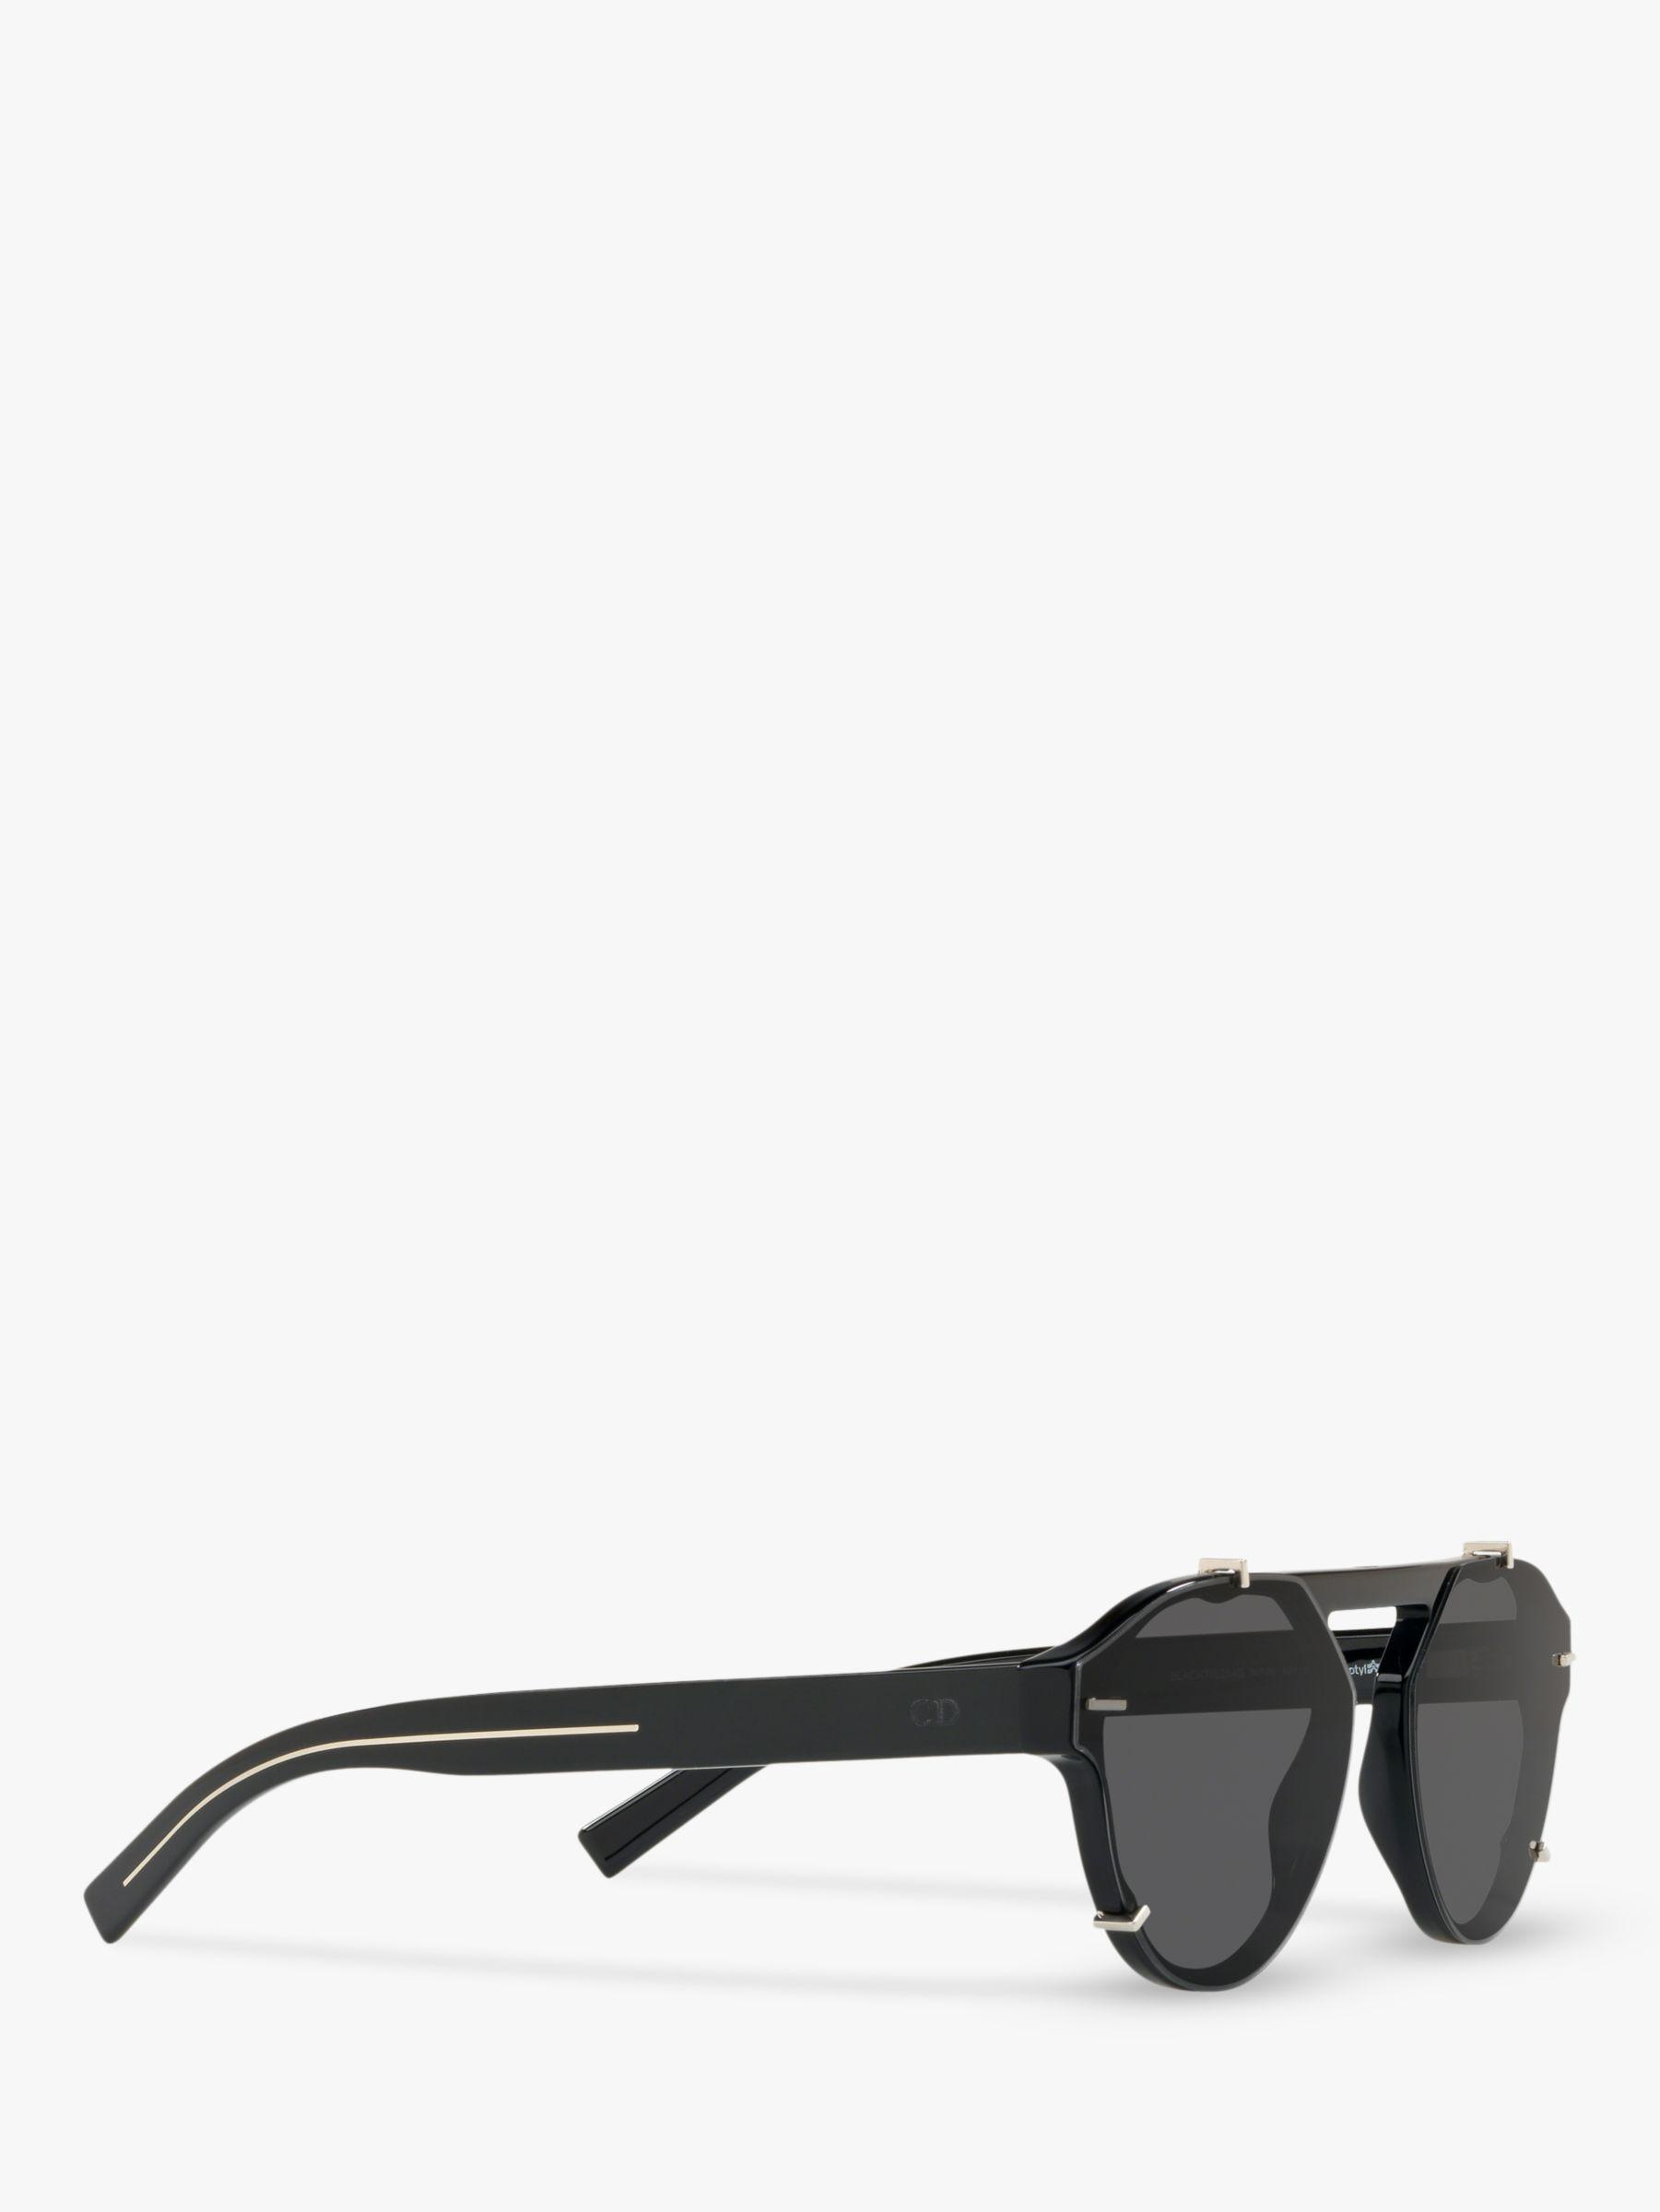 dior blacktie254s men s oval sunglasses in black for men lyst American Flag Oakley Sunglasses view fullscreen